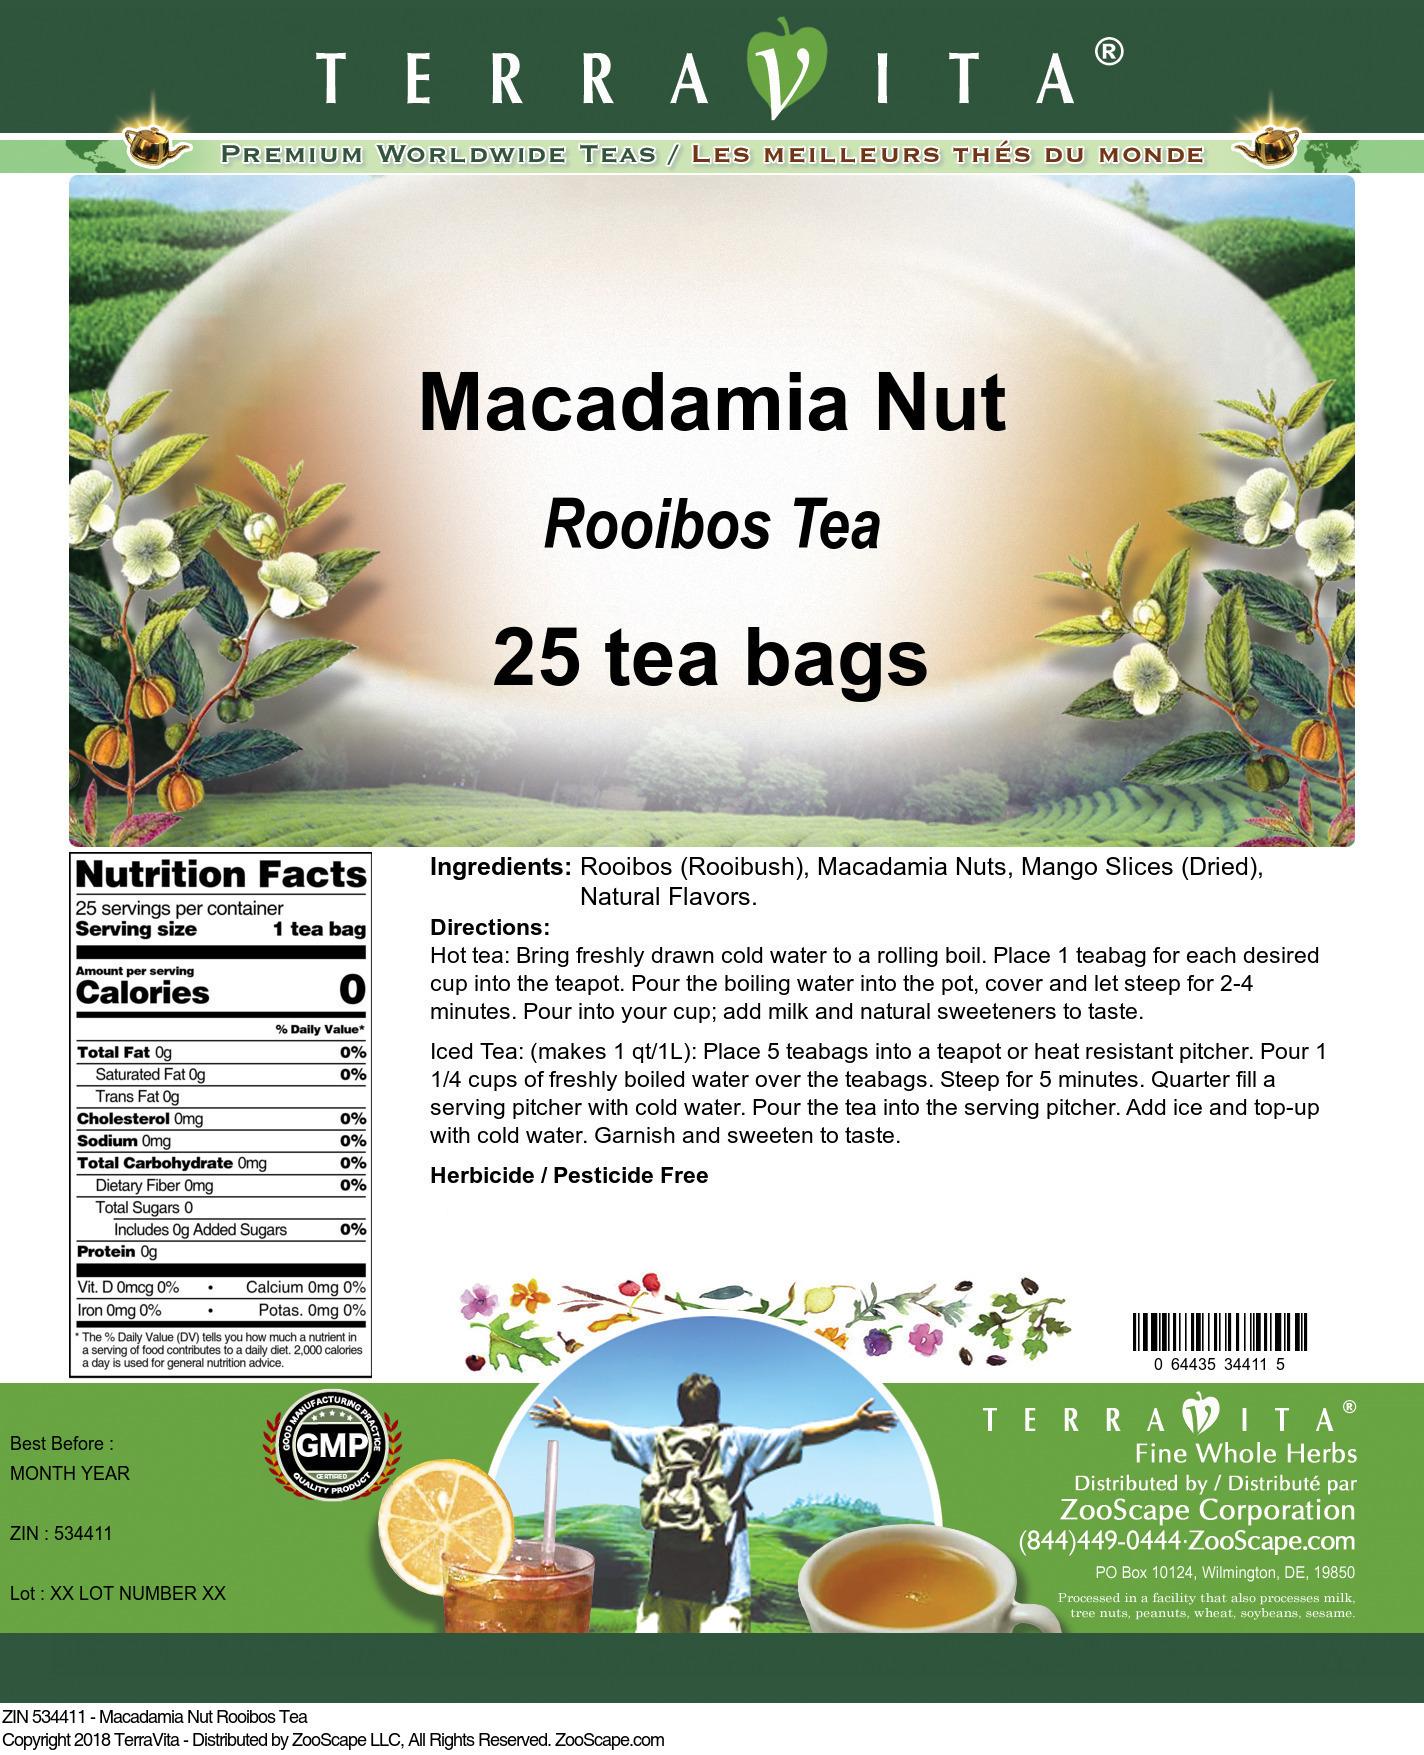 Macadamia Nut Rooibos Tea